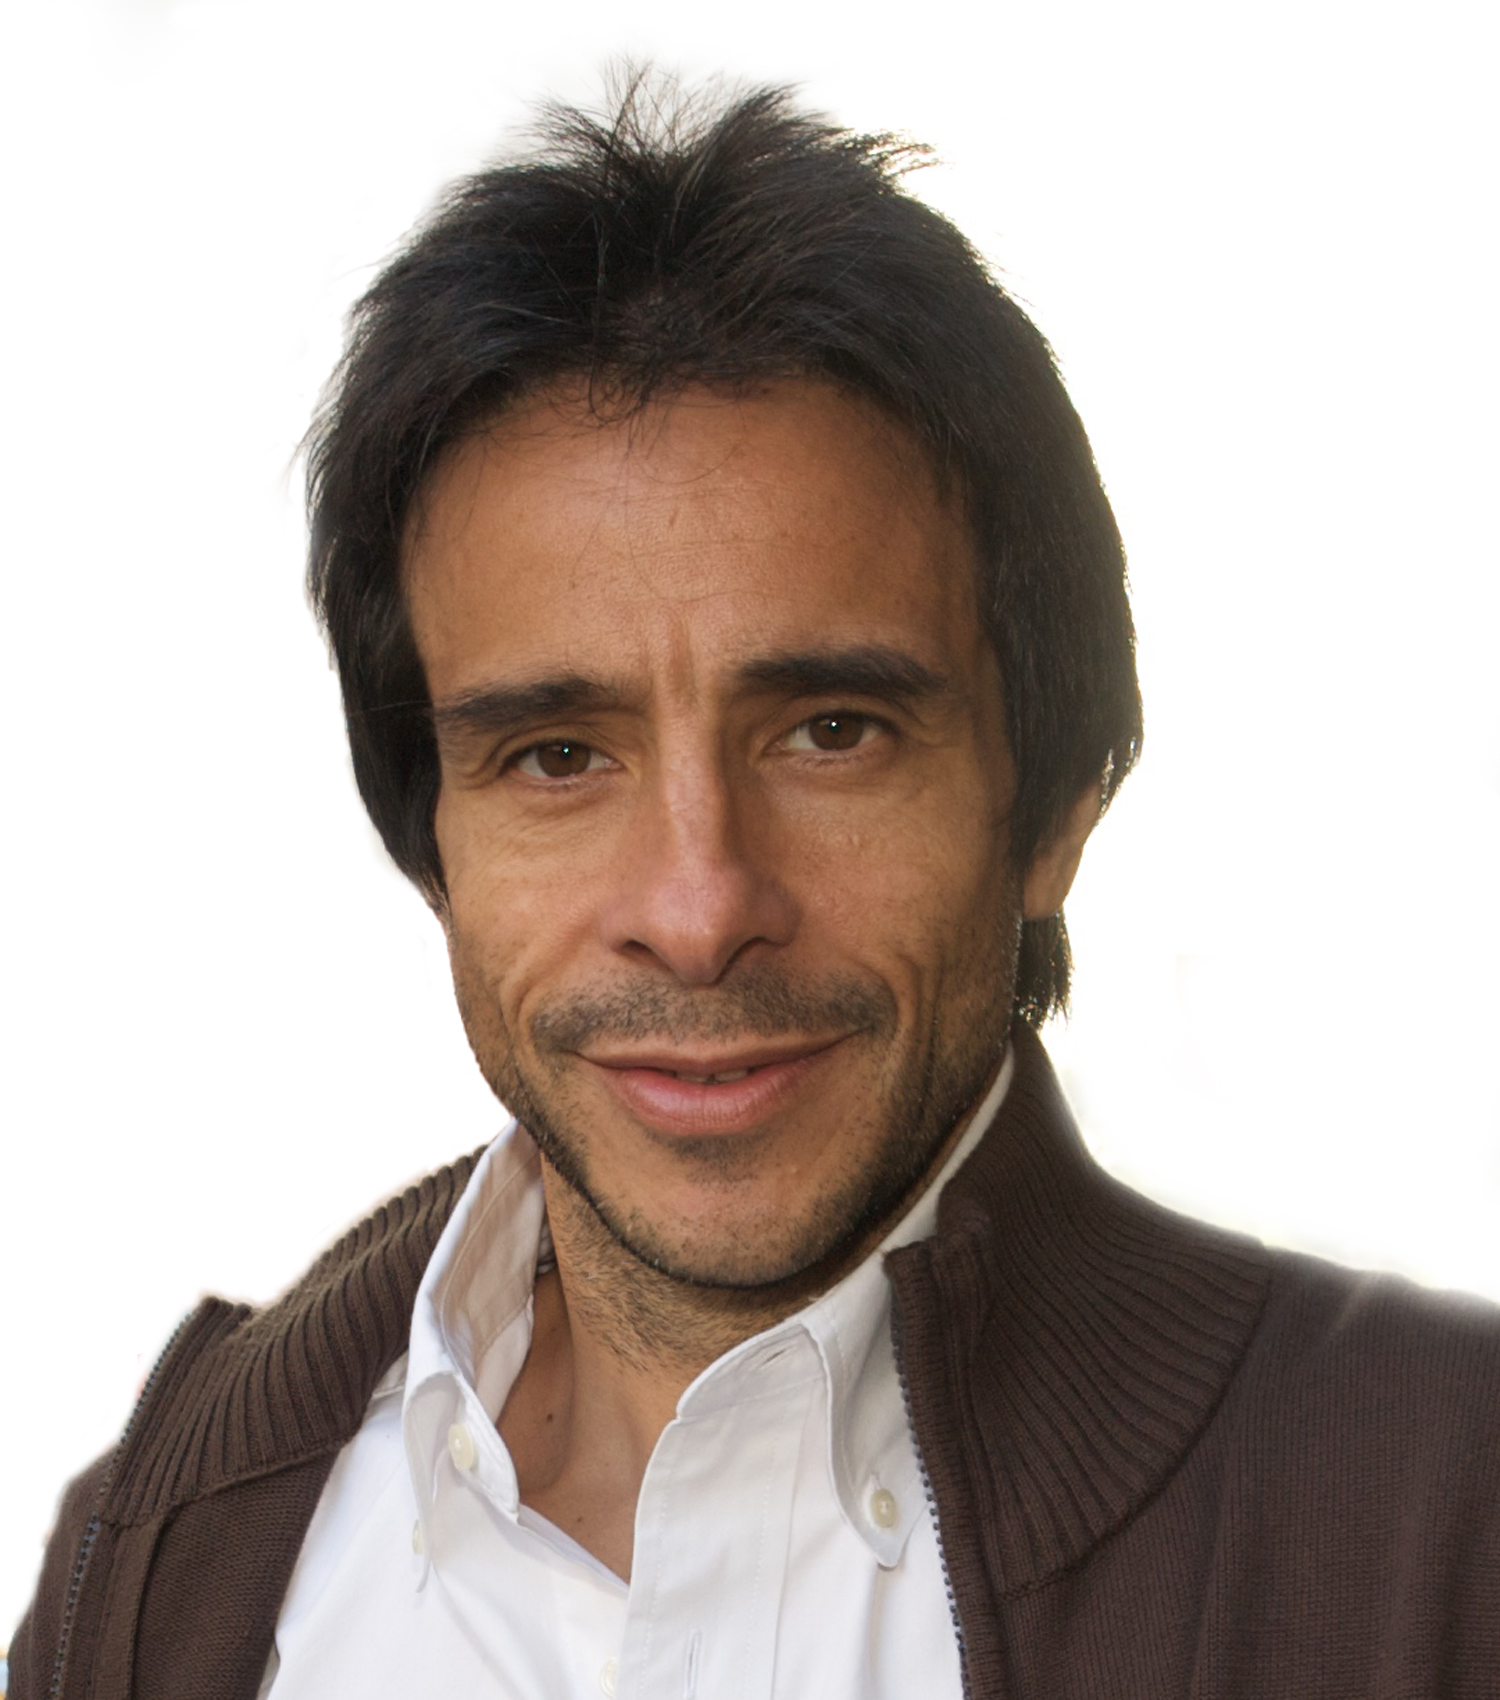 Alberto Gonzalez - alberto-gonzalez